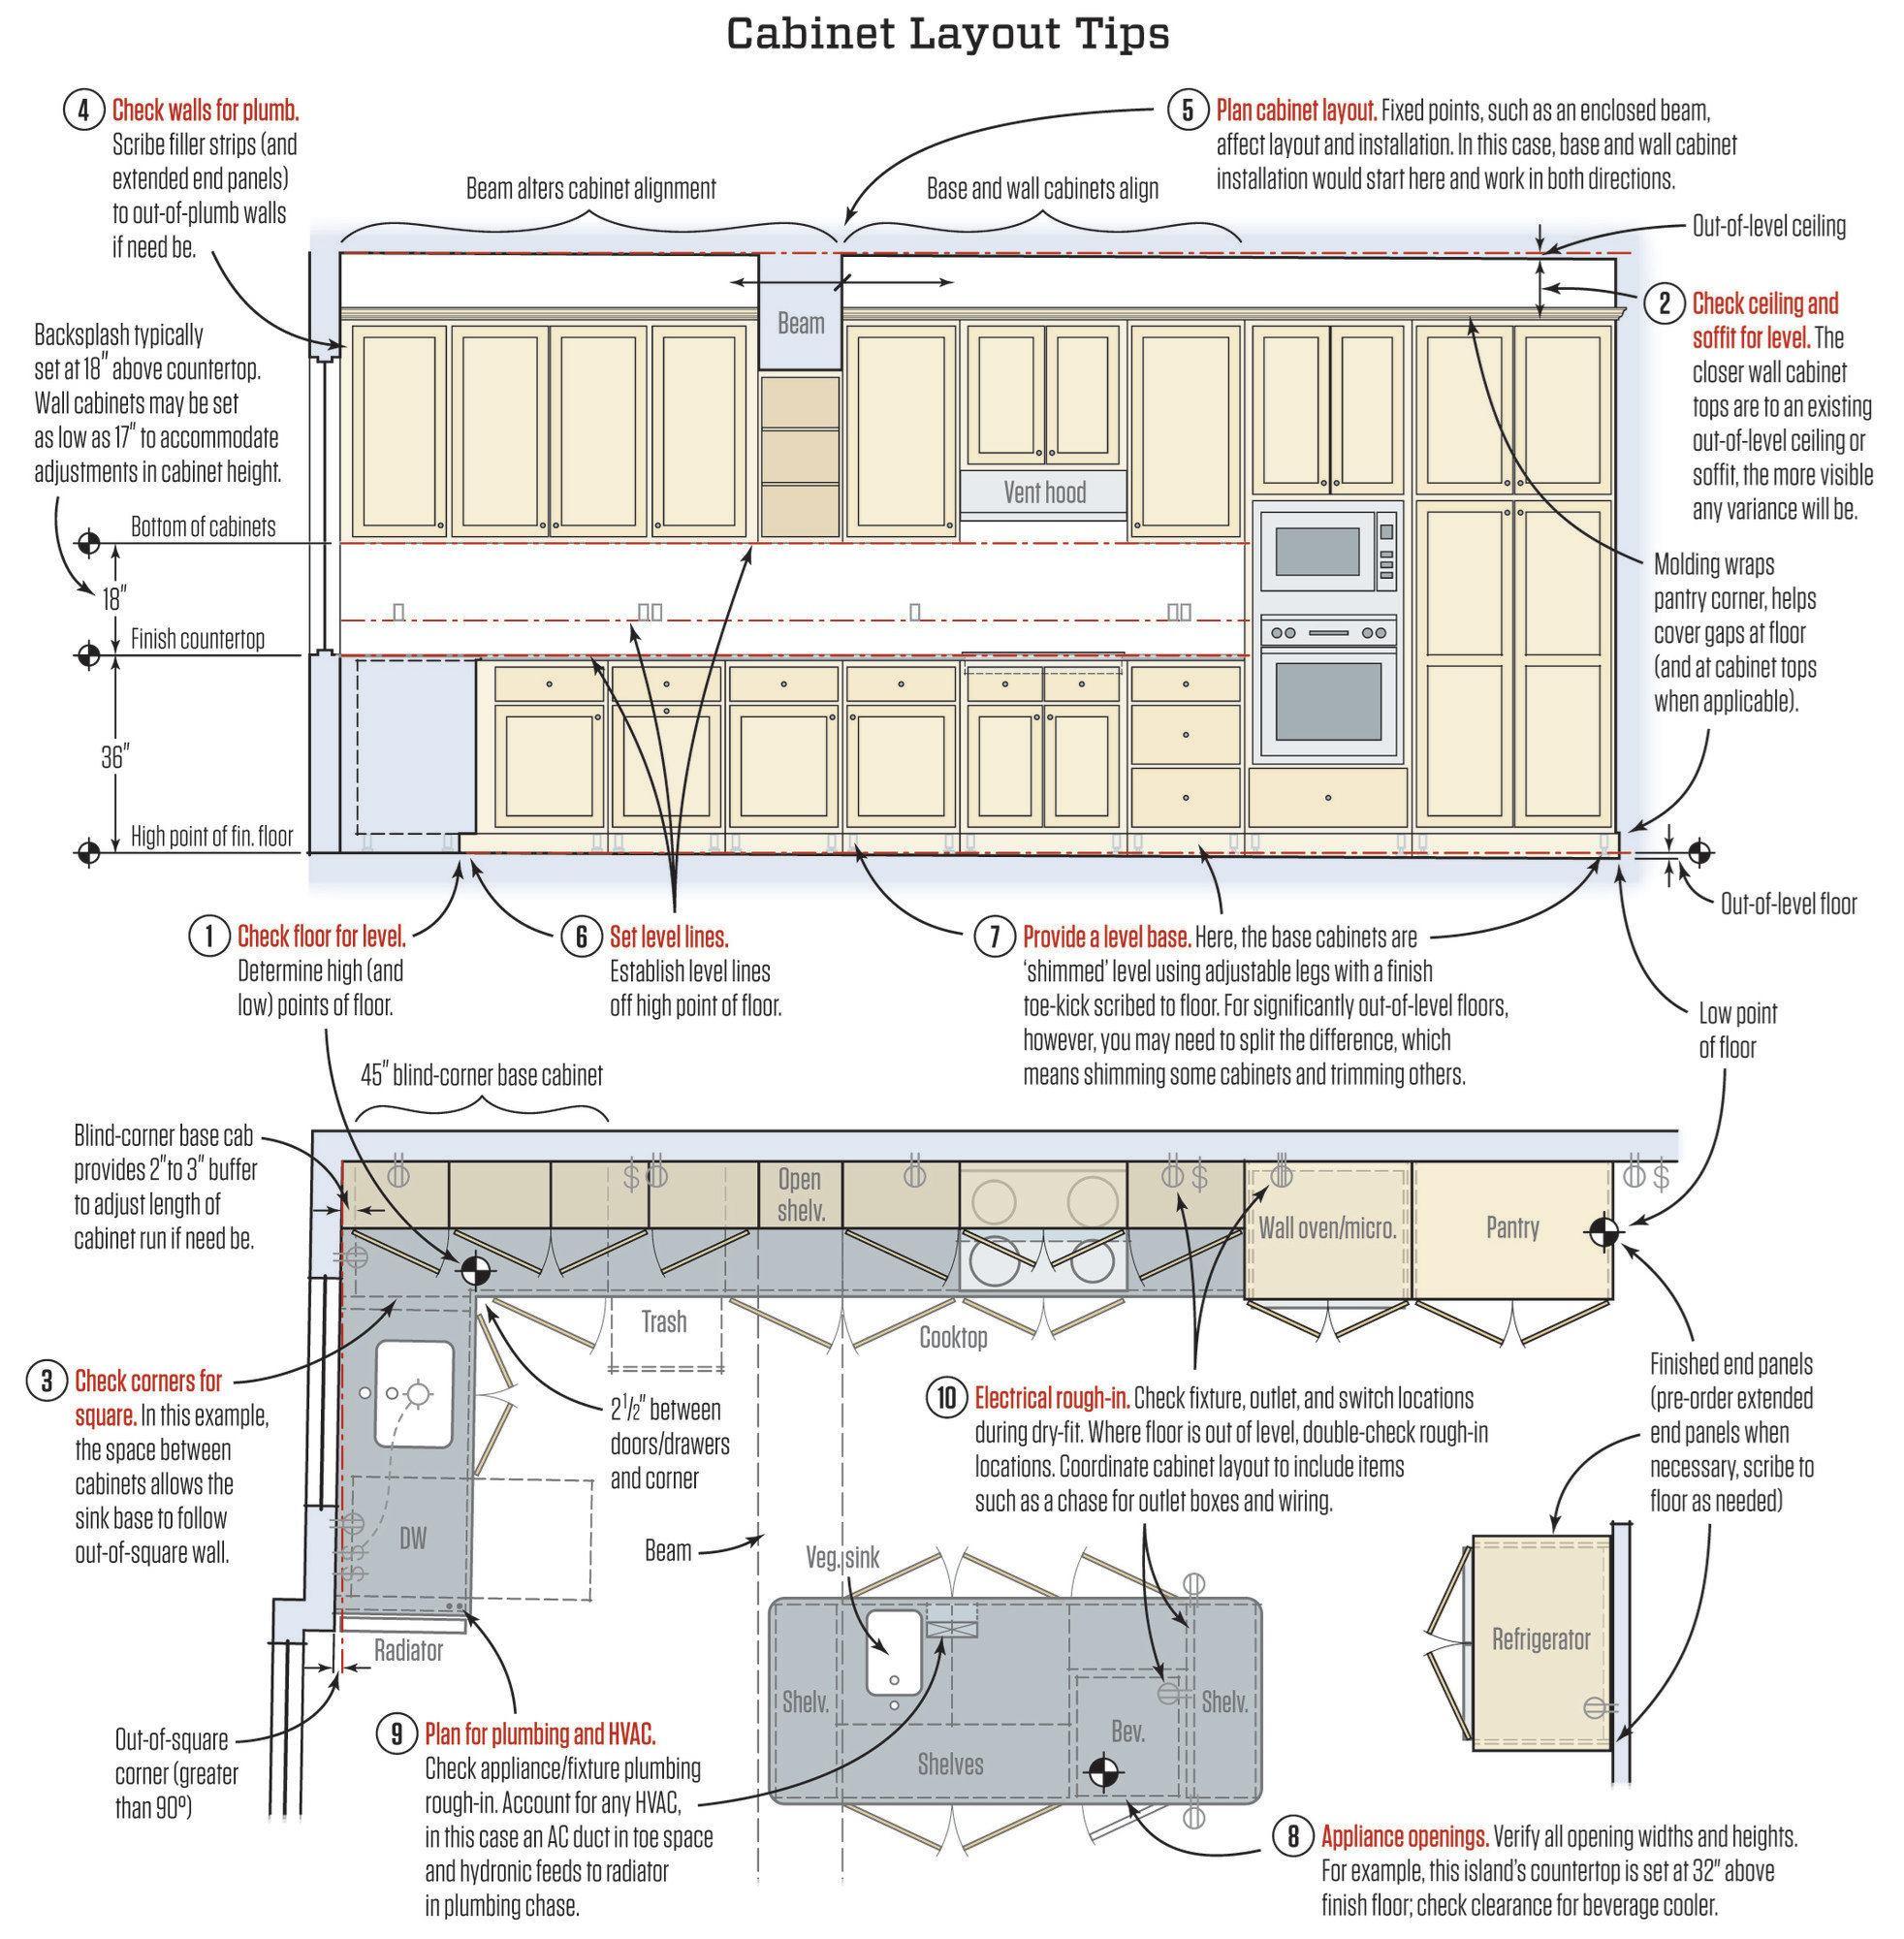 wiring diagram for kitchen appliances free download wiring diagram rh xwiaw us